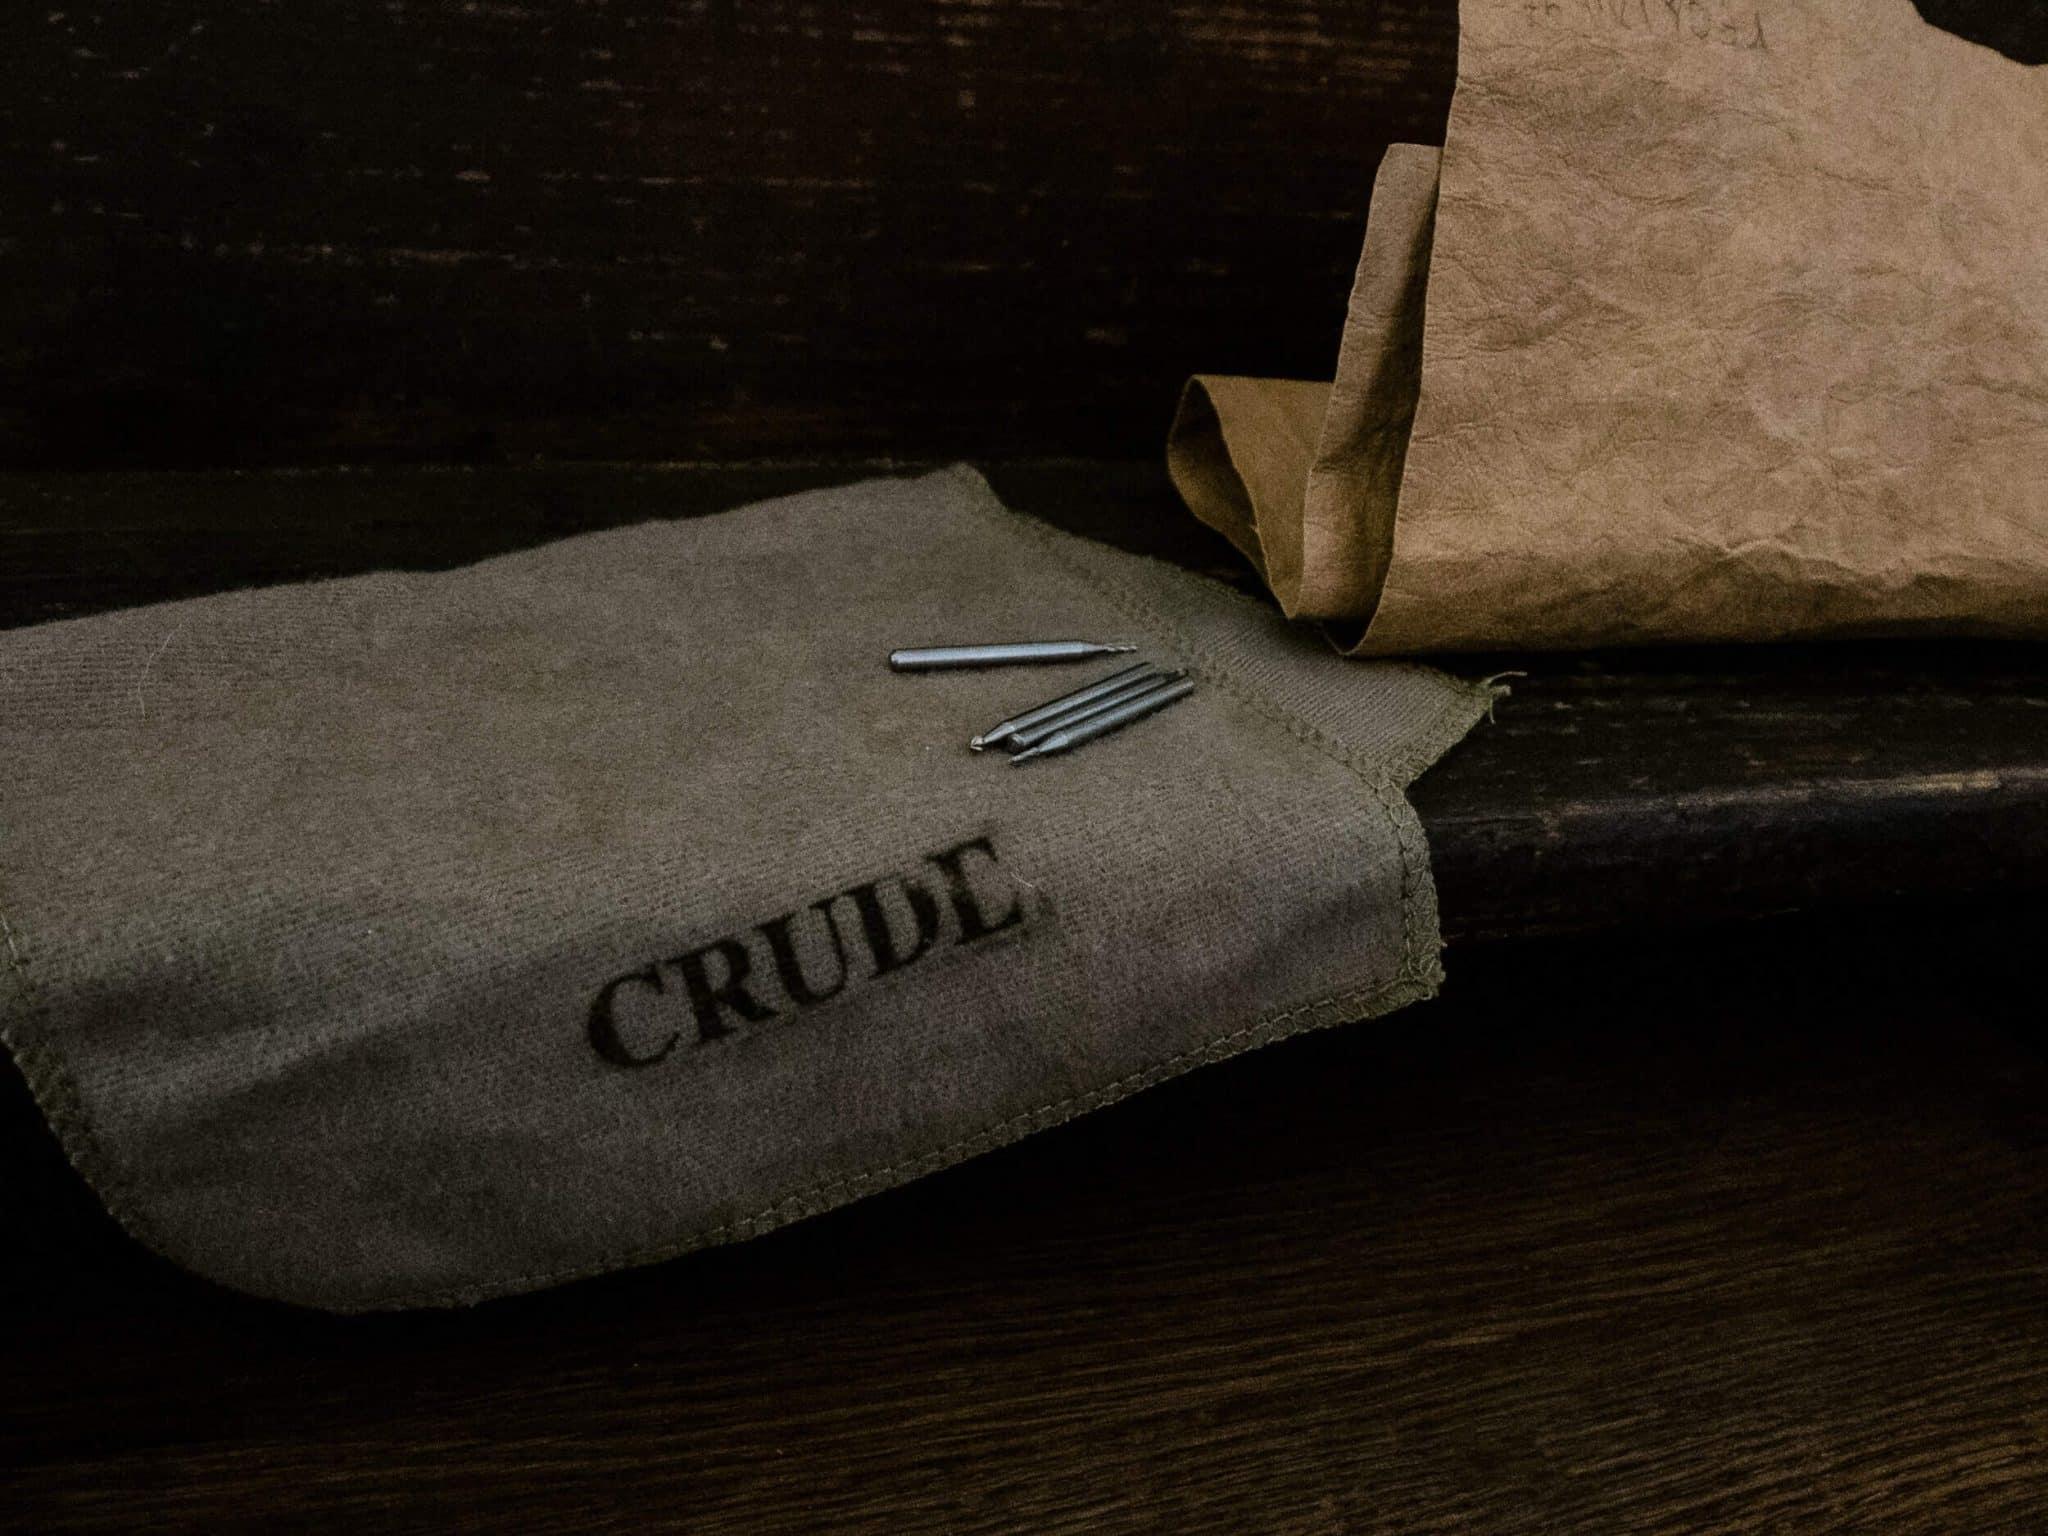 Web-Crude-work-002